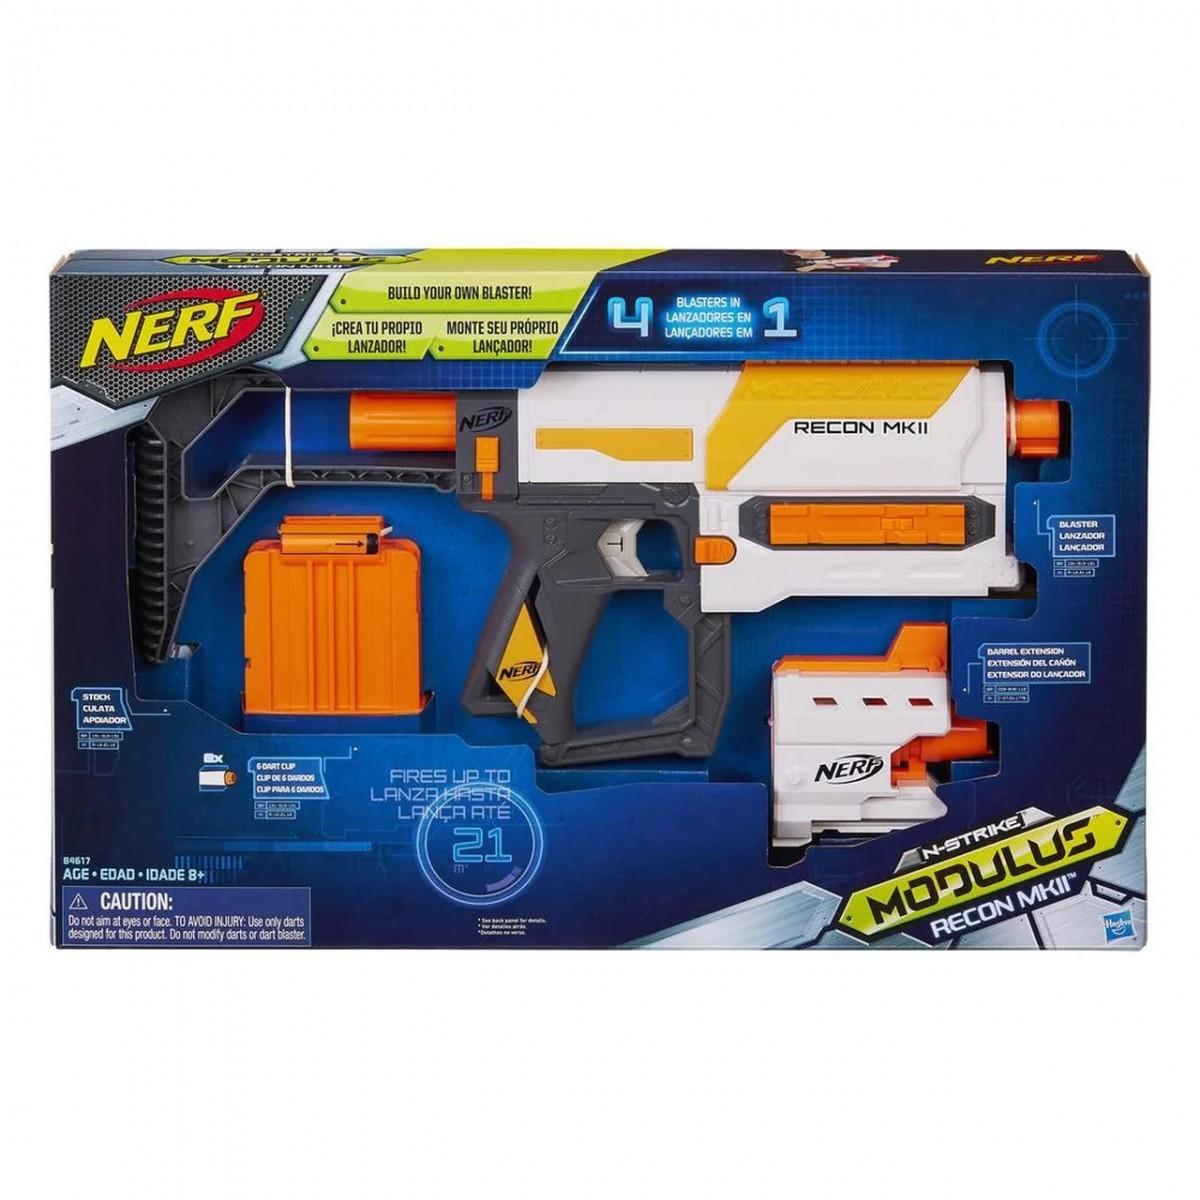 Nerf N-Strike Modulus Recon MKII (Lançador de Dardos)